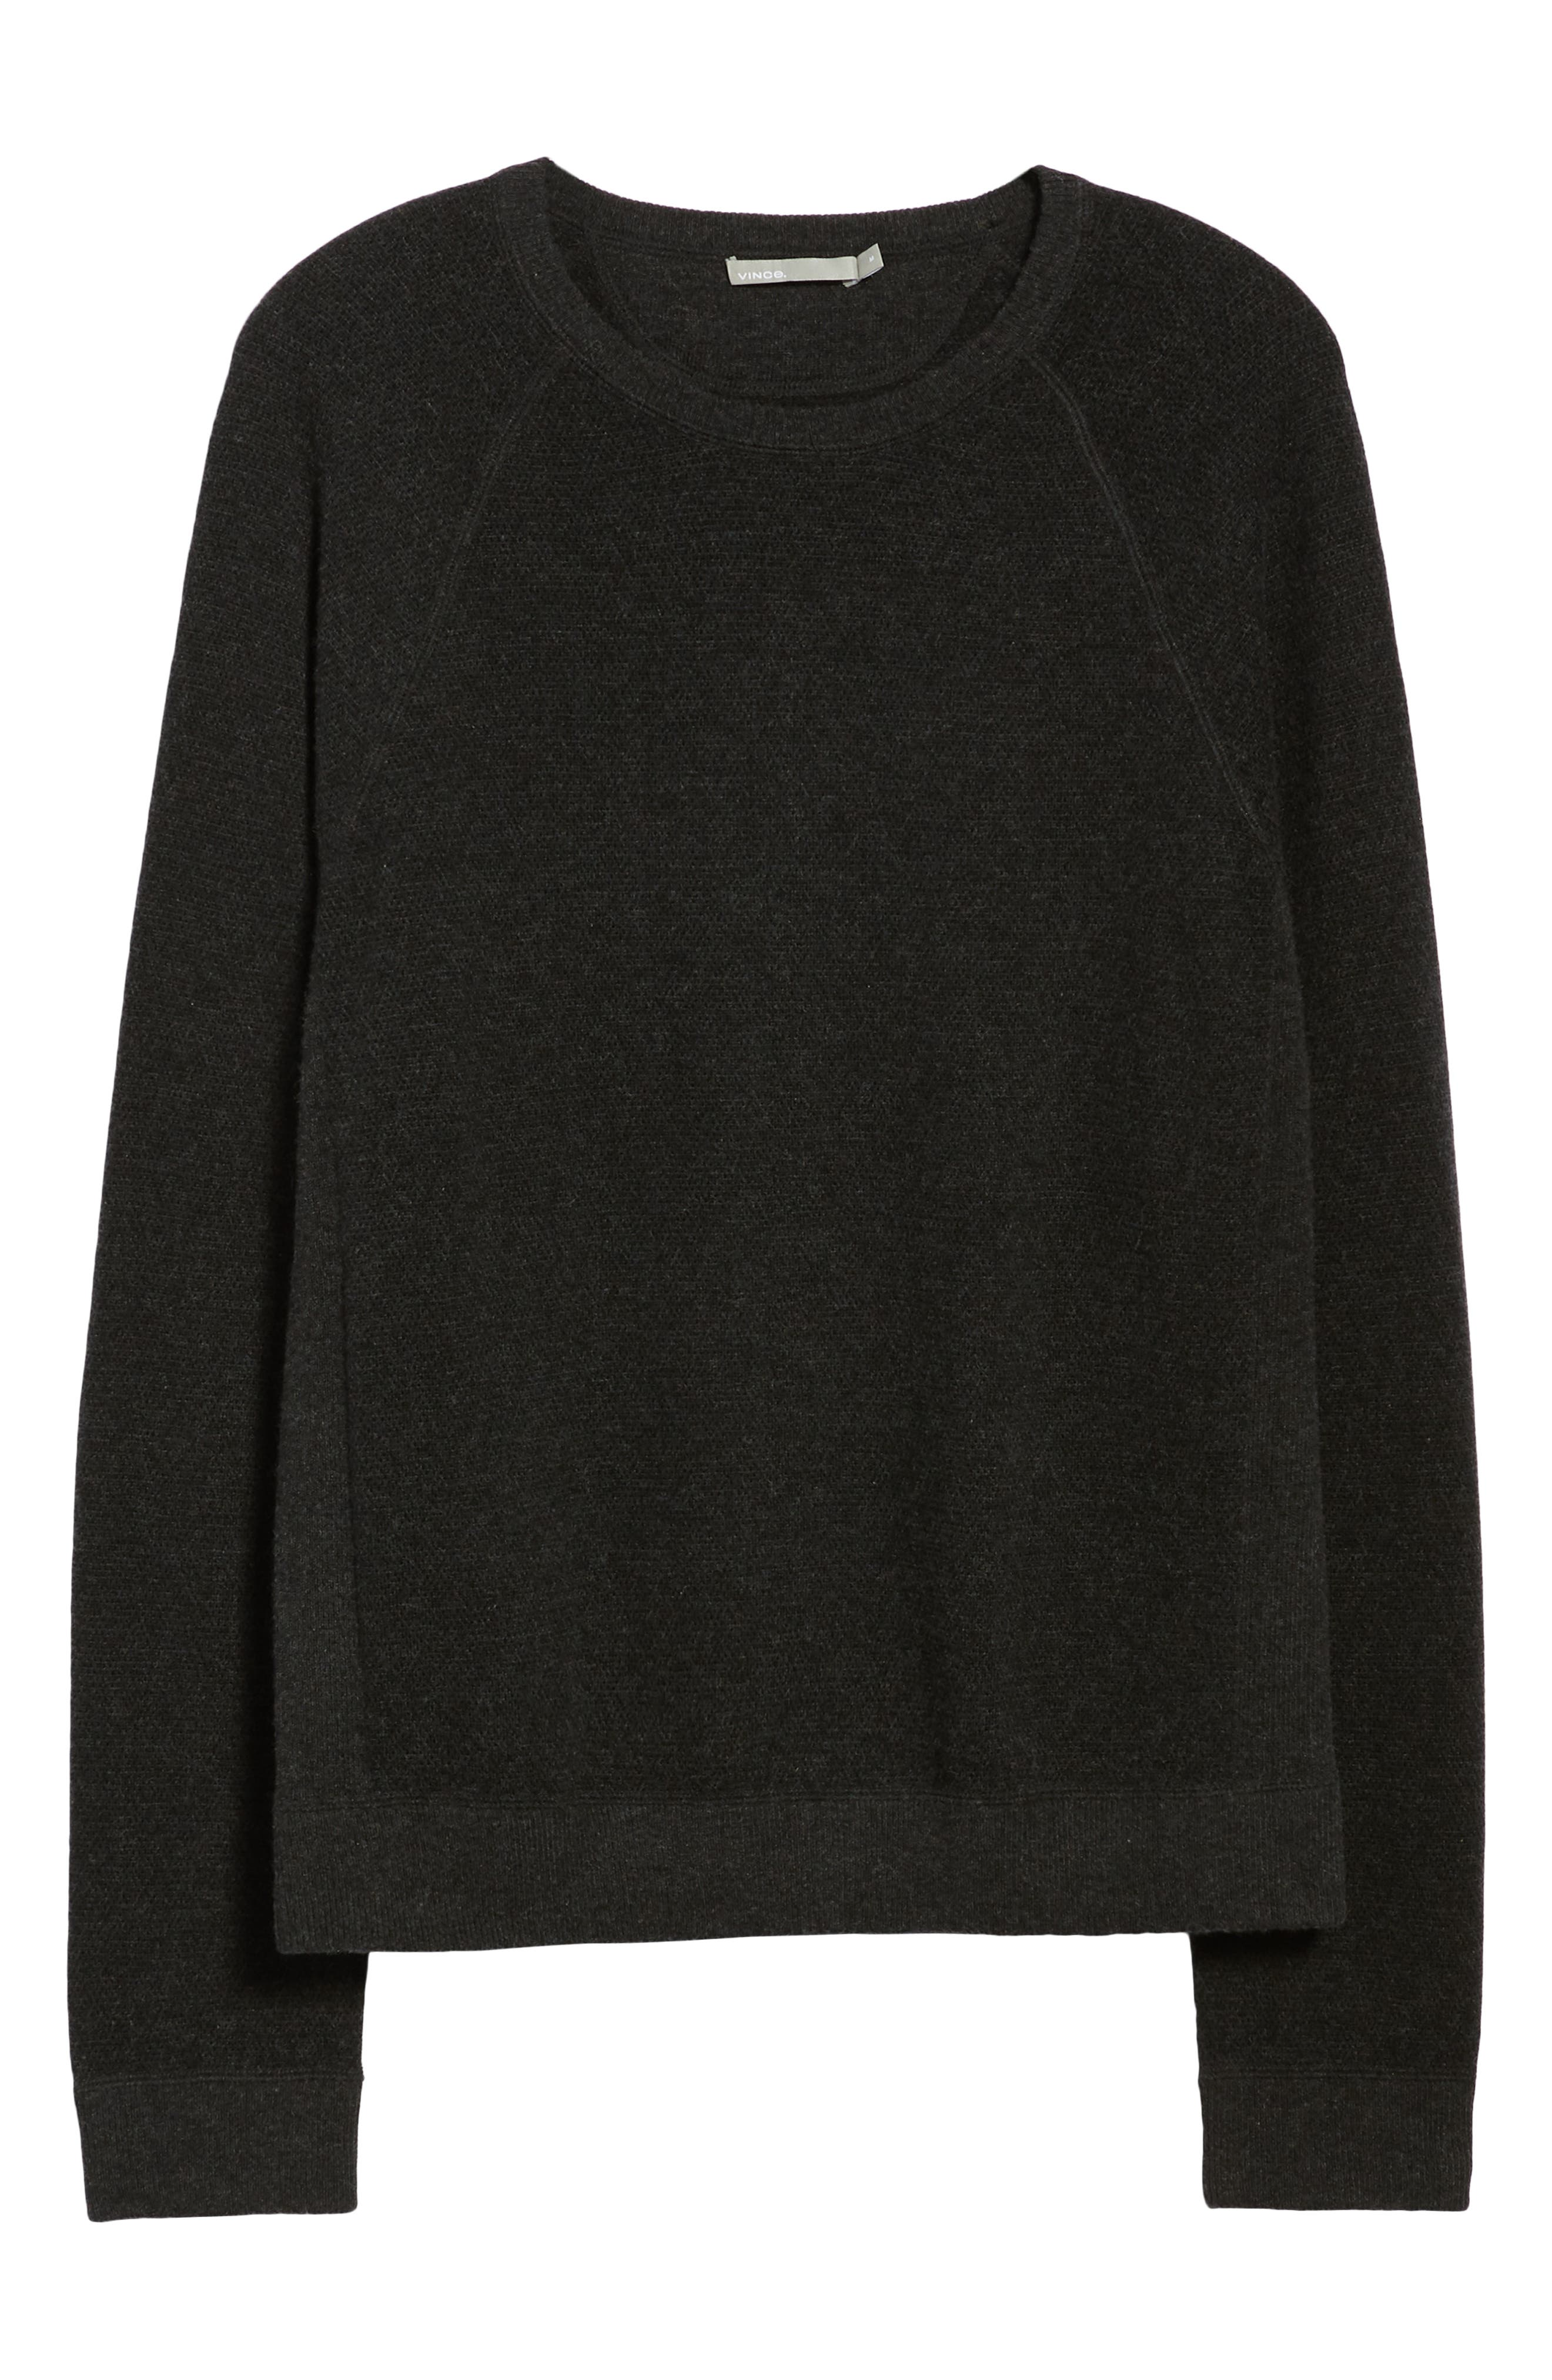 Bird's Eye Sweater,                             Alternate thumbnail 6, color,                             H CHARCOAL/ BLACK